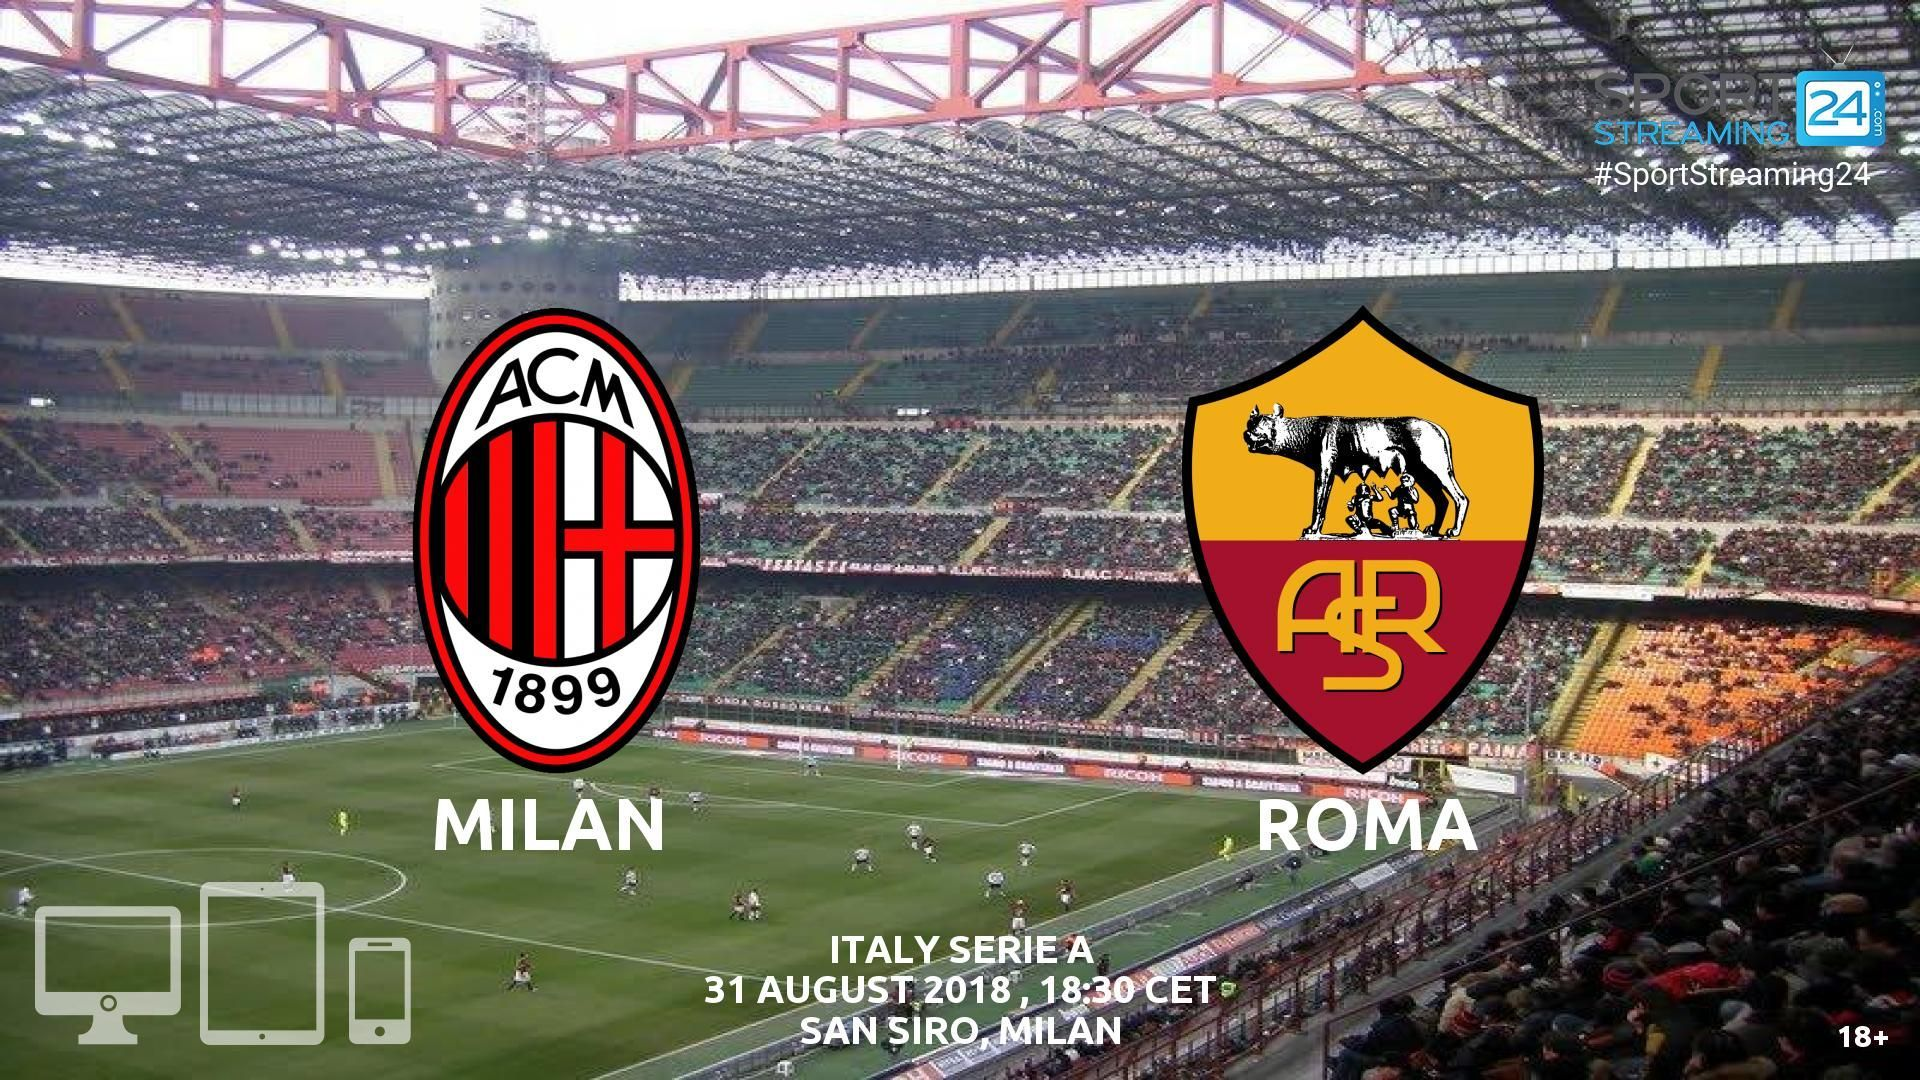 AC Milan v Roma Live Streaming Football